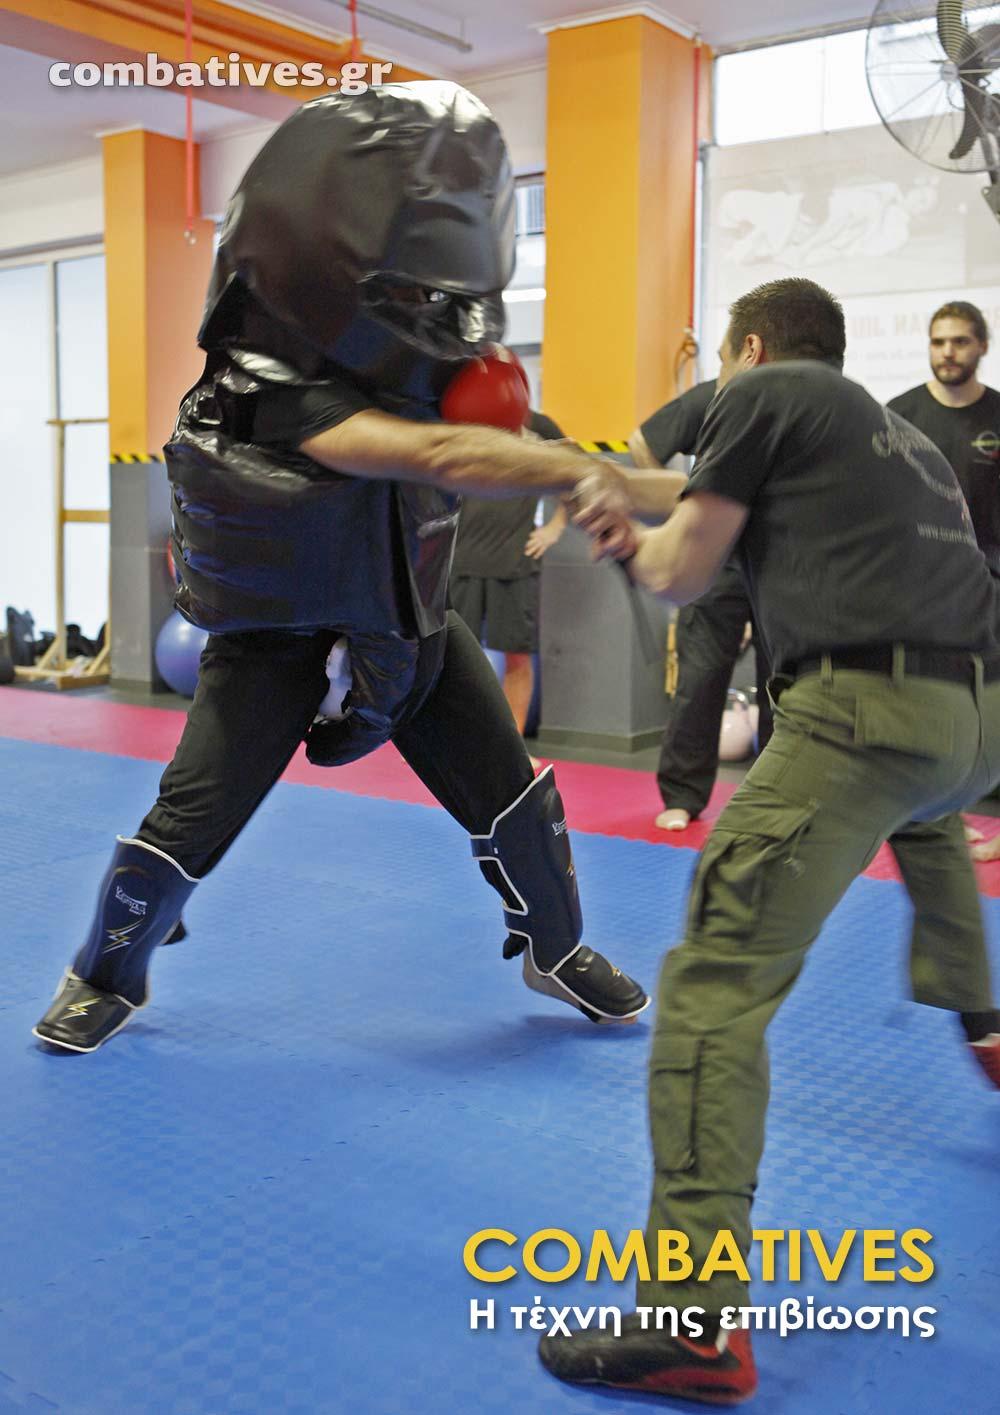 Combatives, αυτοάμυνα κατάλληλη για όλους